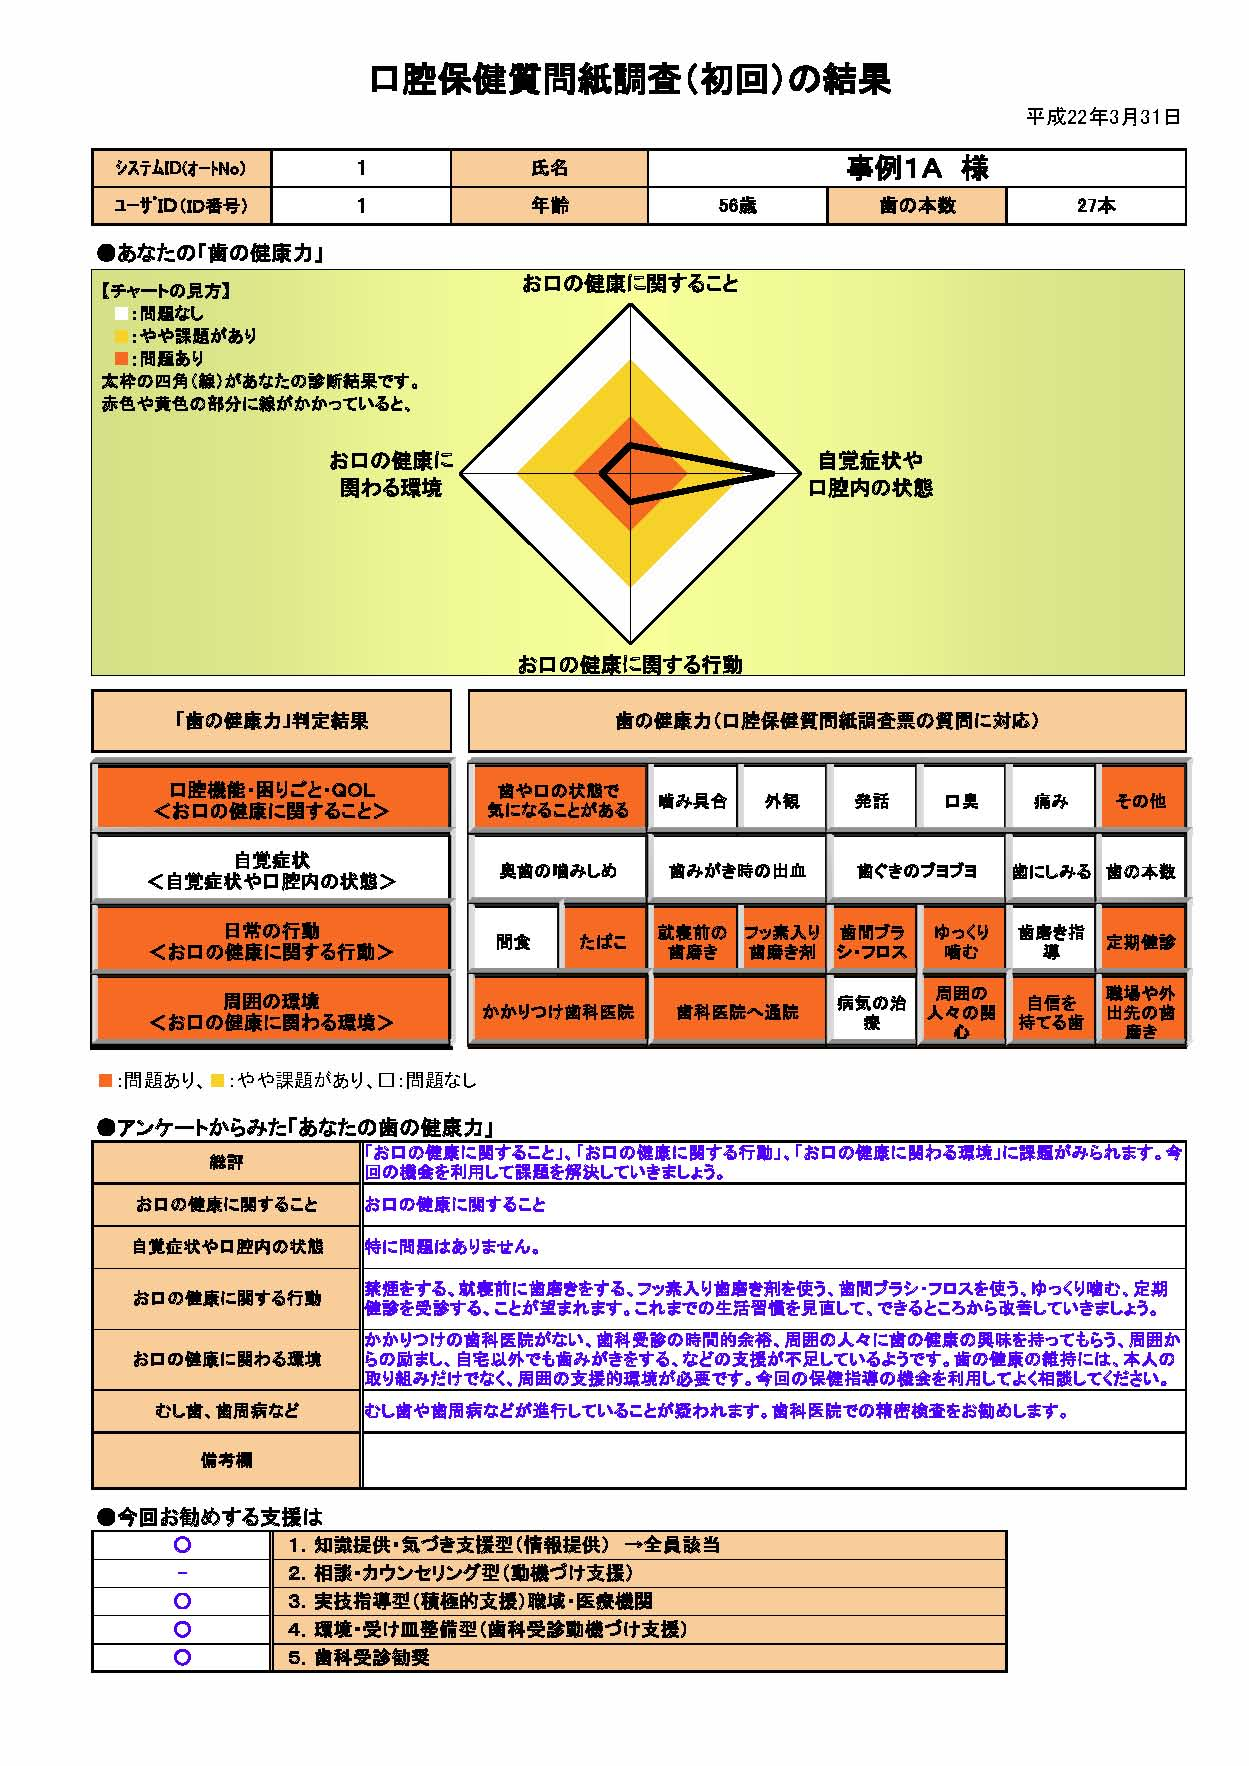 判定集計・成人歯科健診・保健指導プログラム.jpg